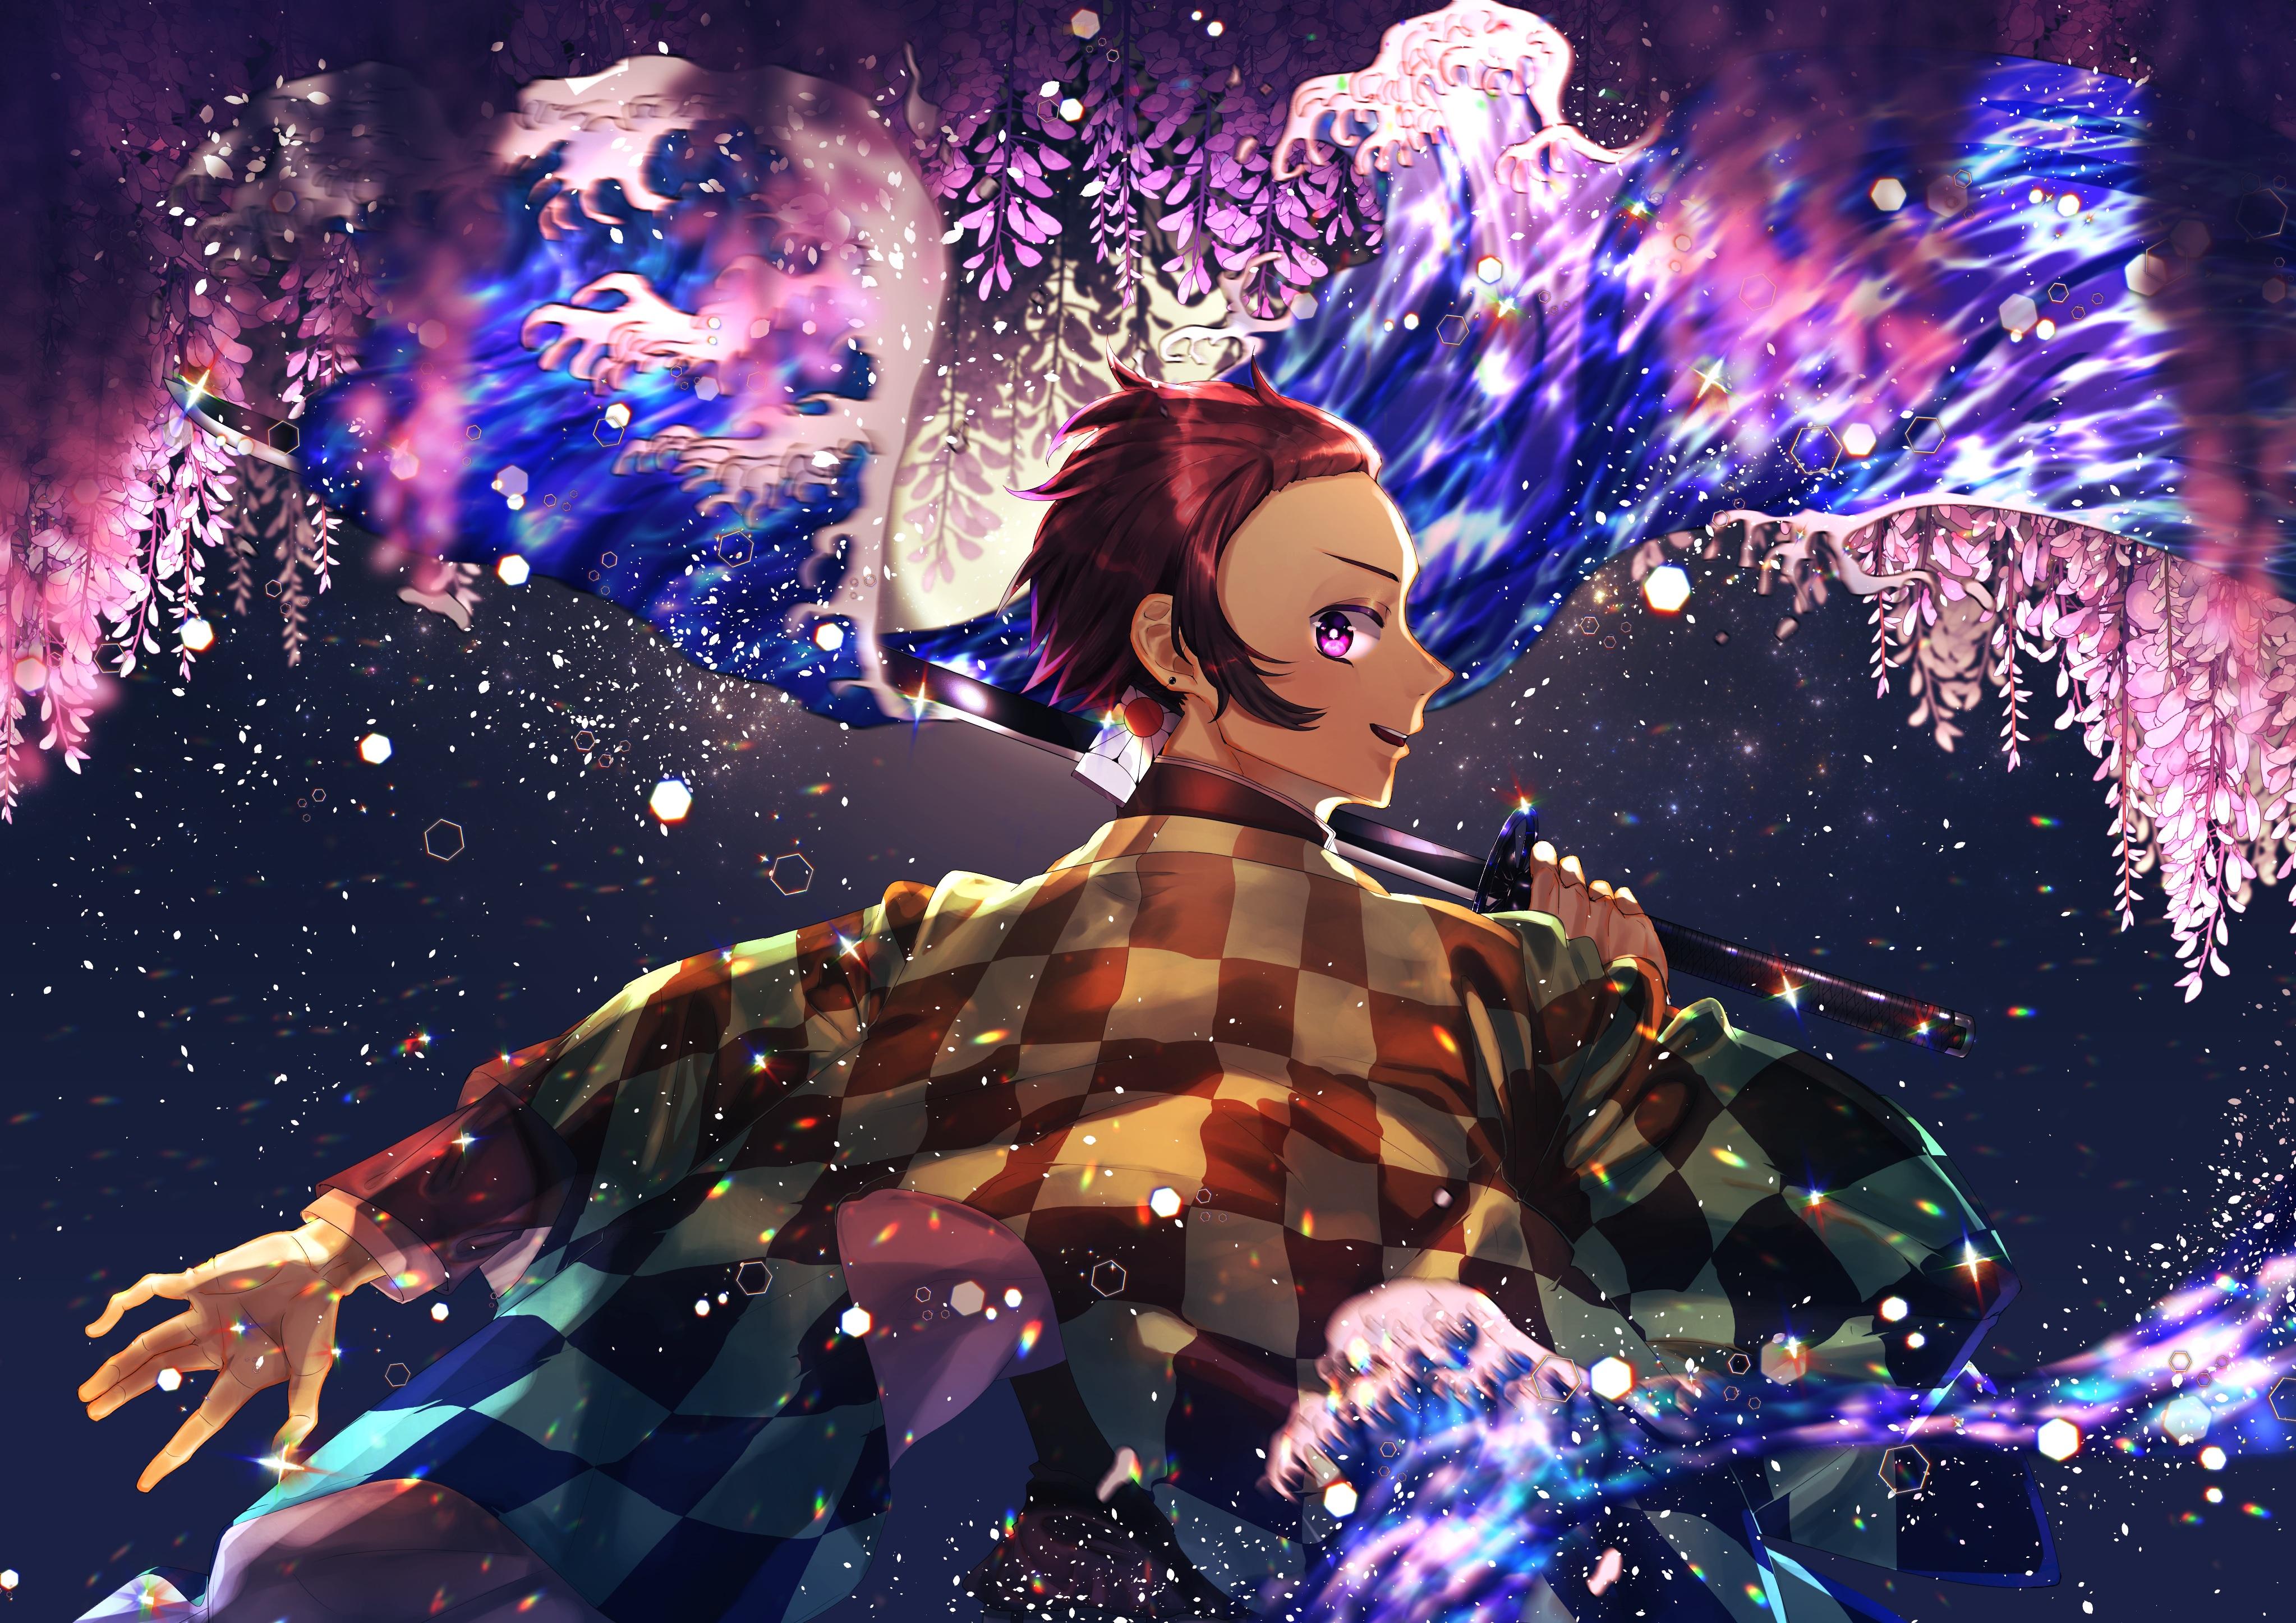 29+ Demon Slayer Kimetsu No Yaiba 4K Wallpapers on ...